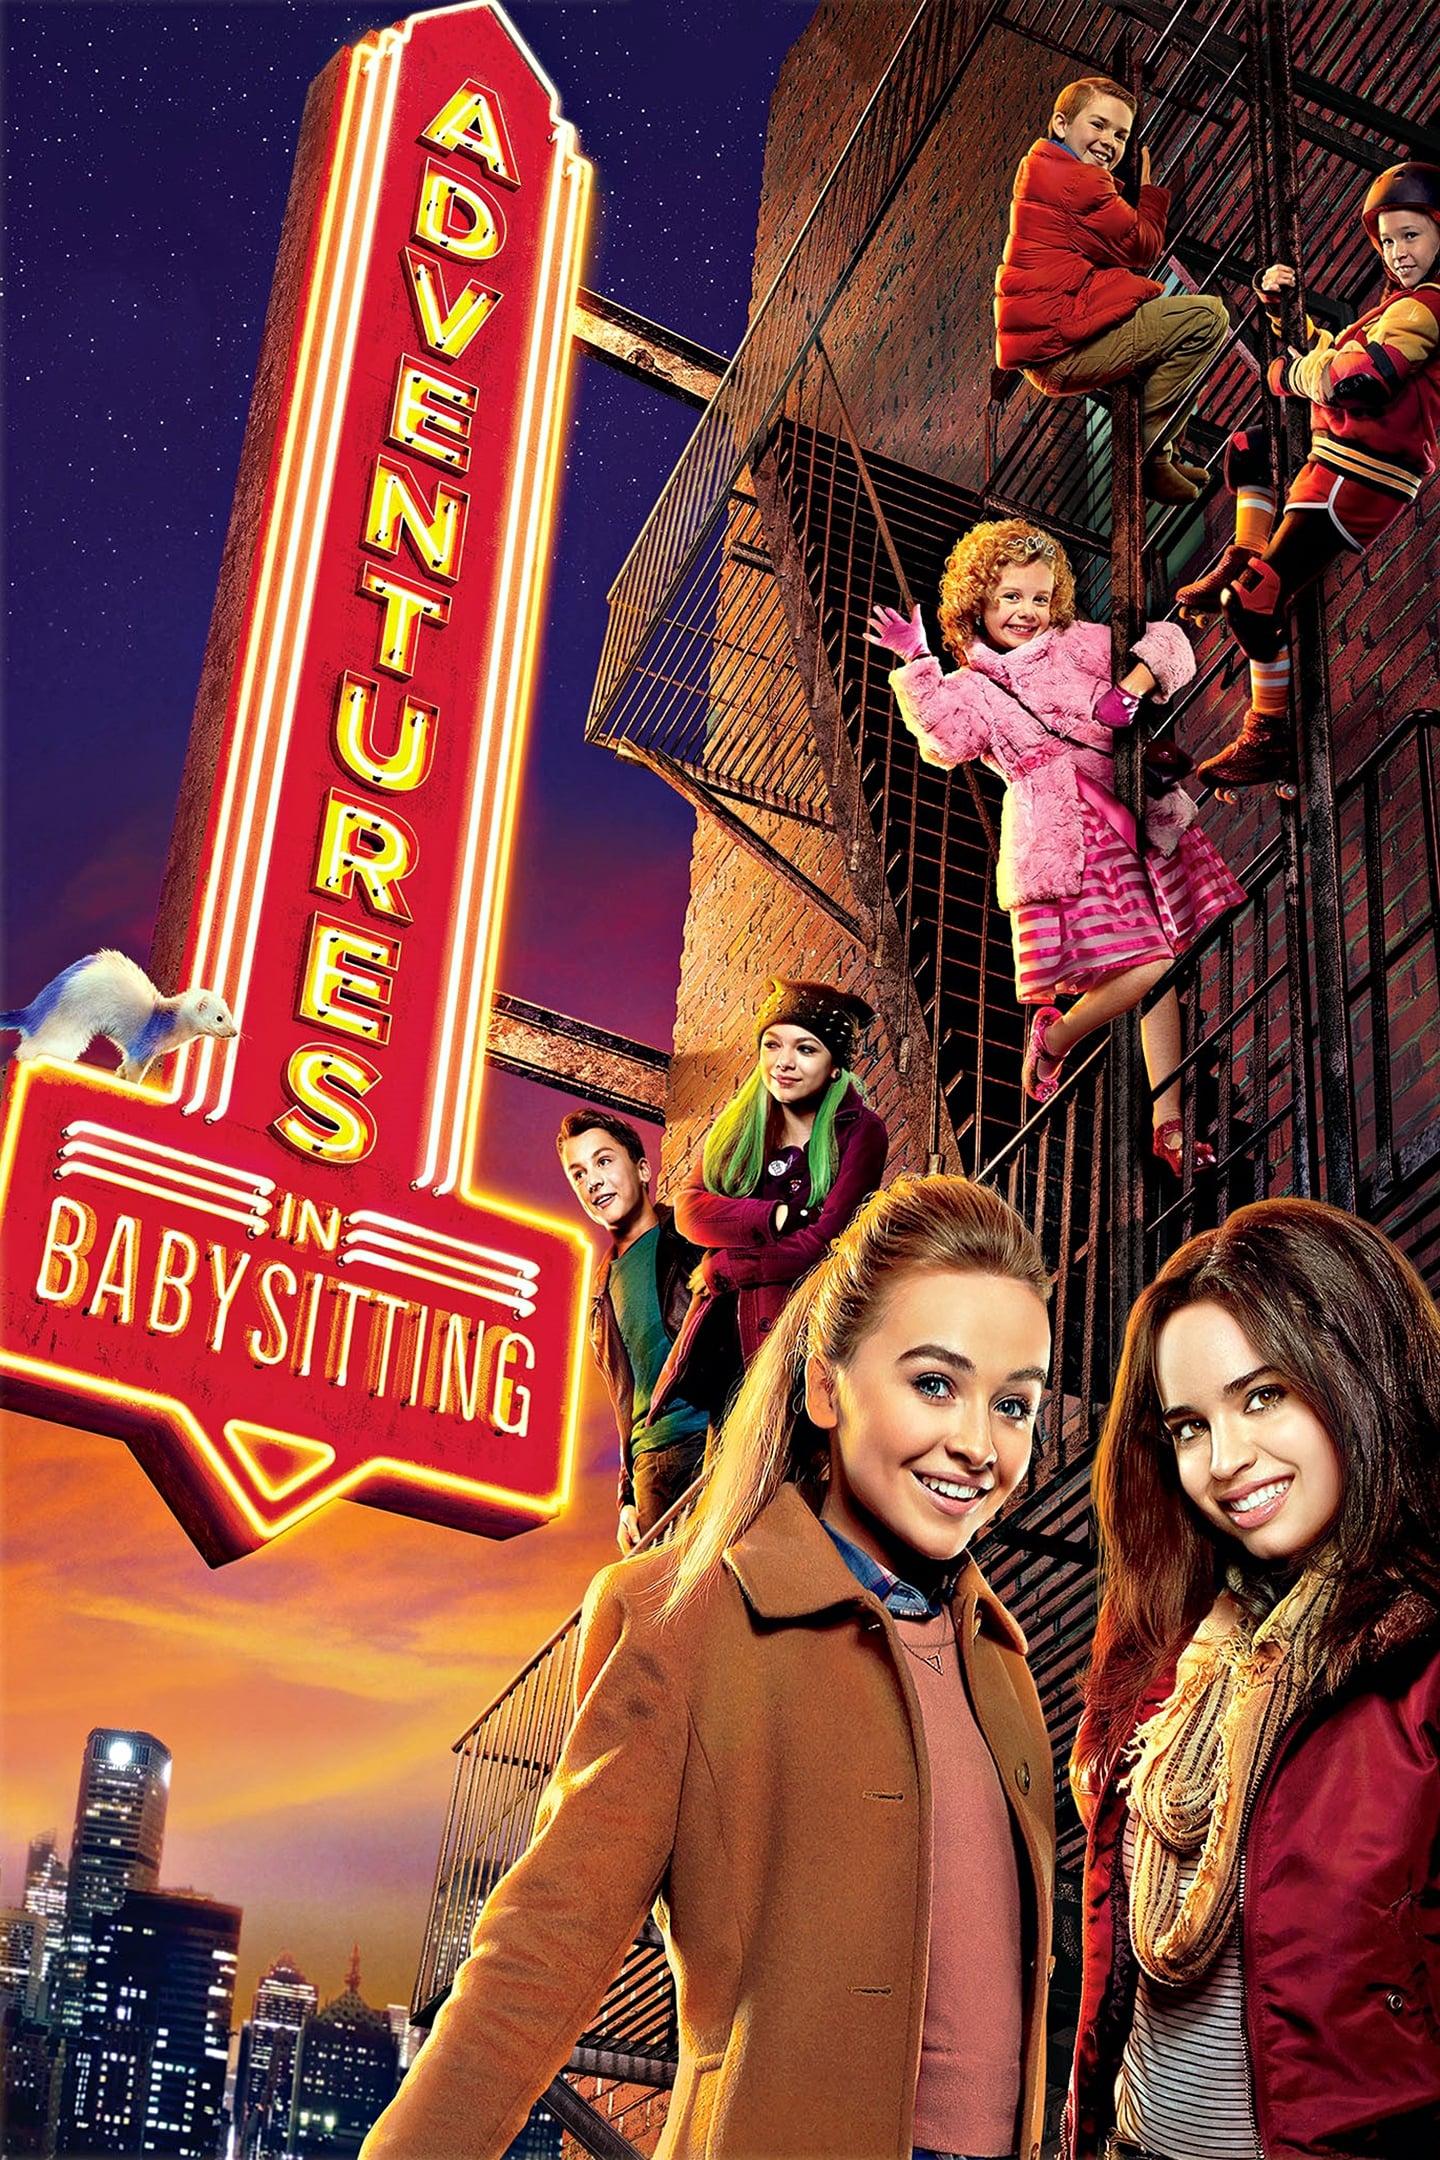 保姆大冒险 Adventures in Babysitting (2016) 中文字幕